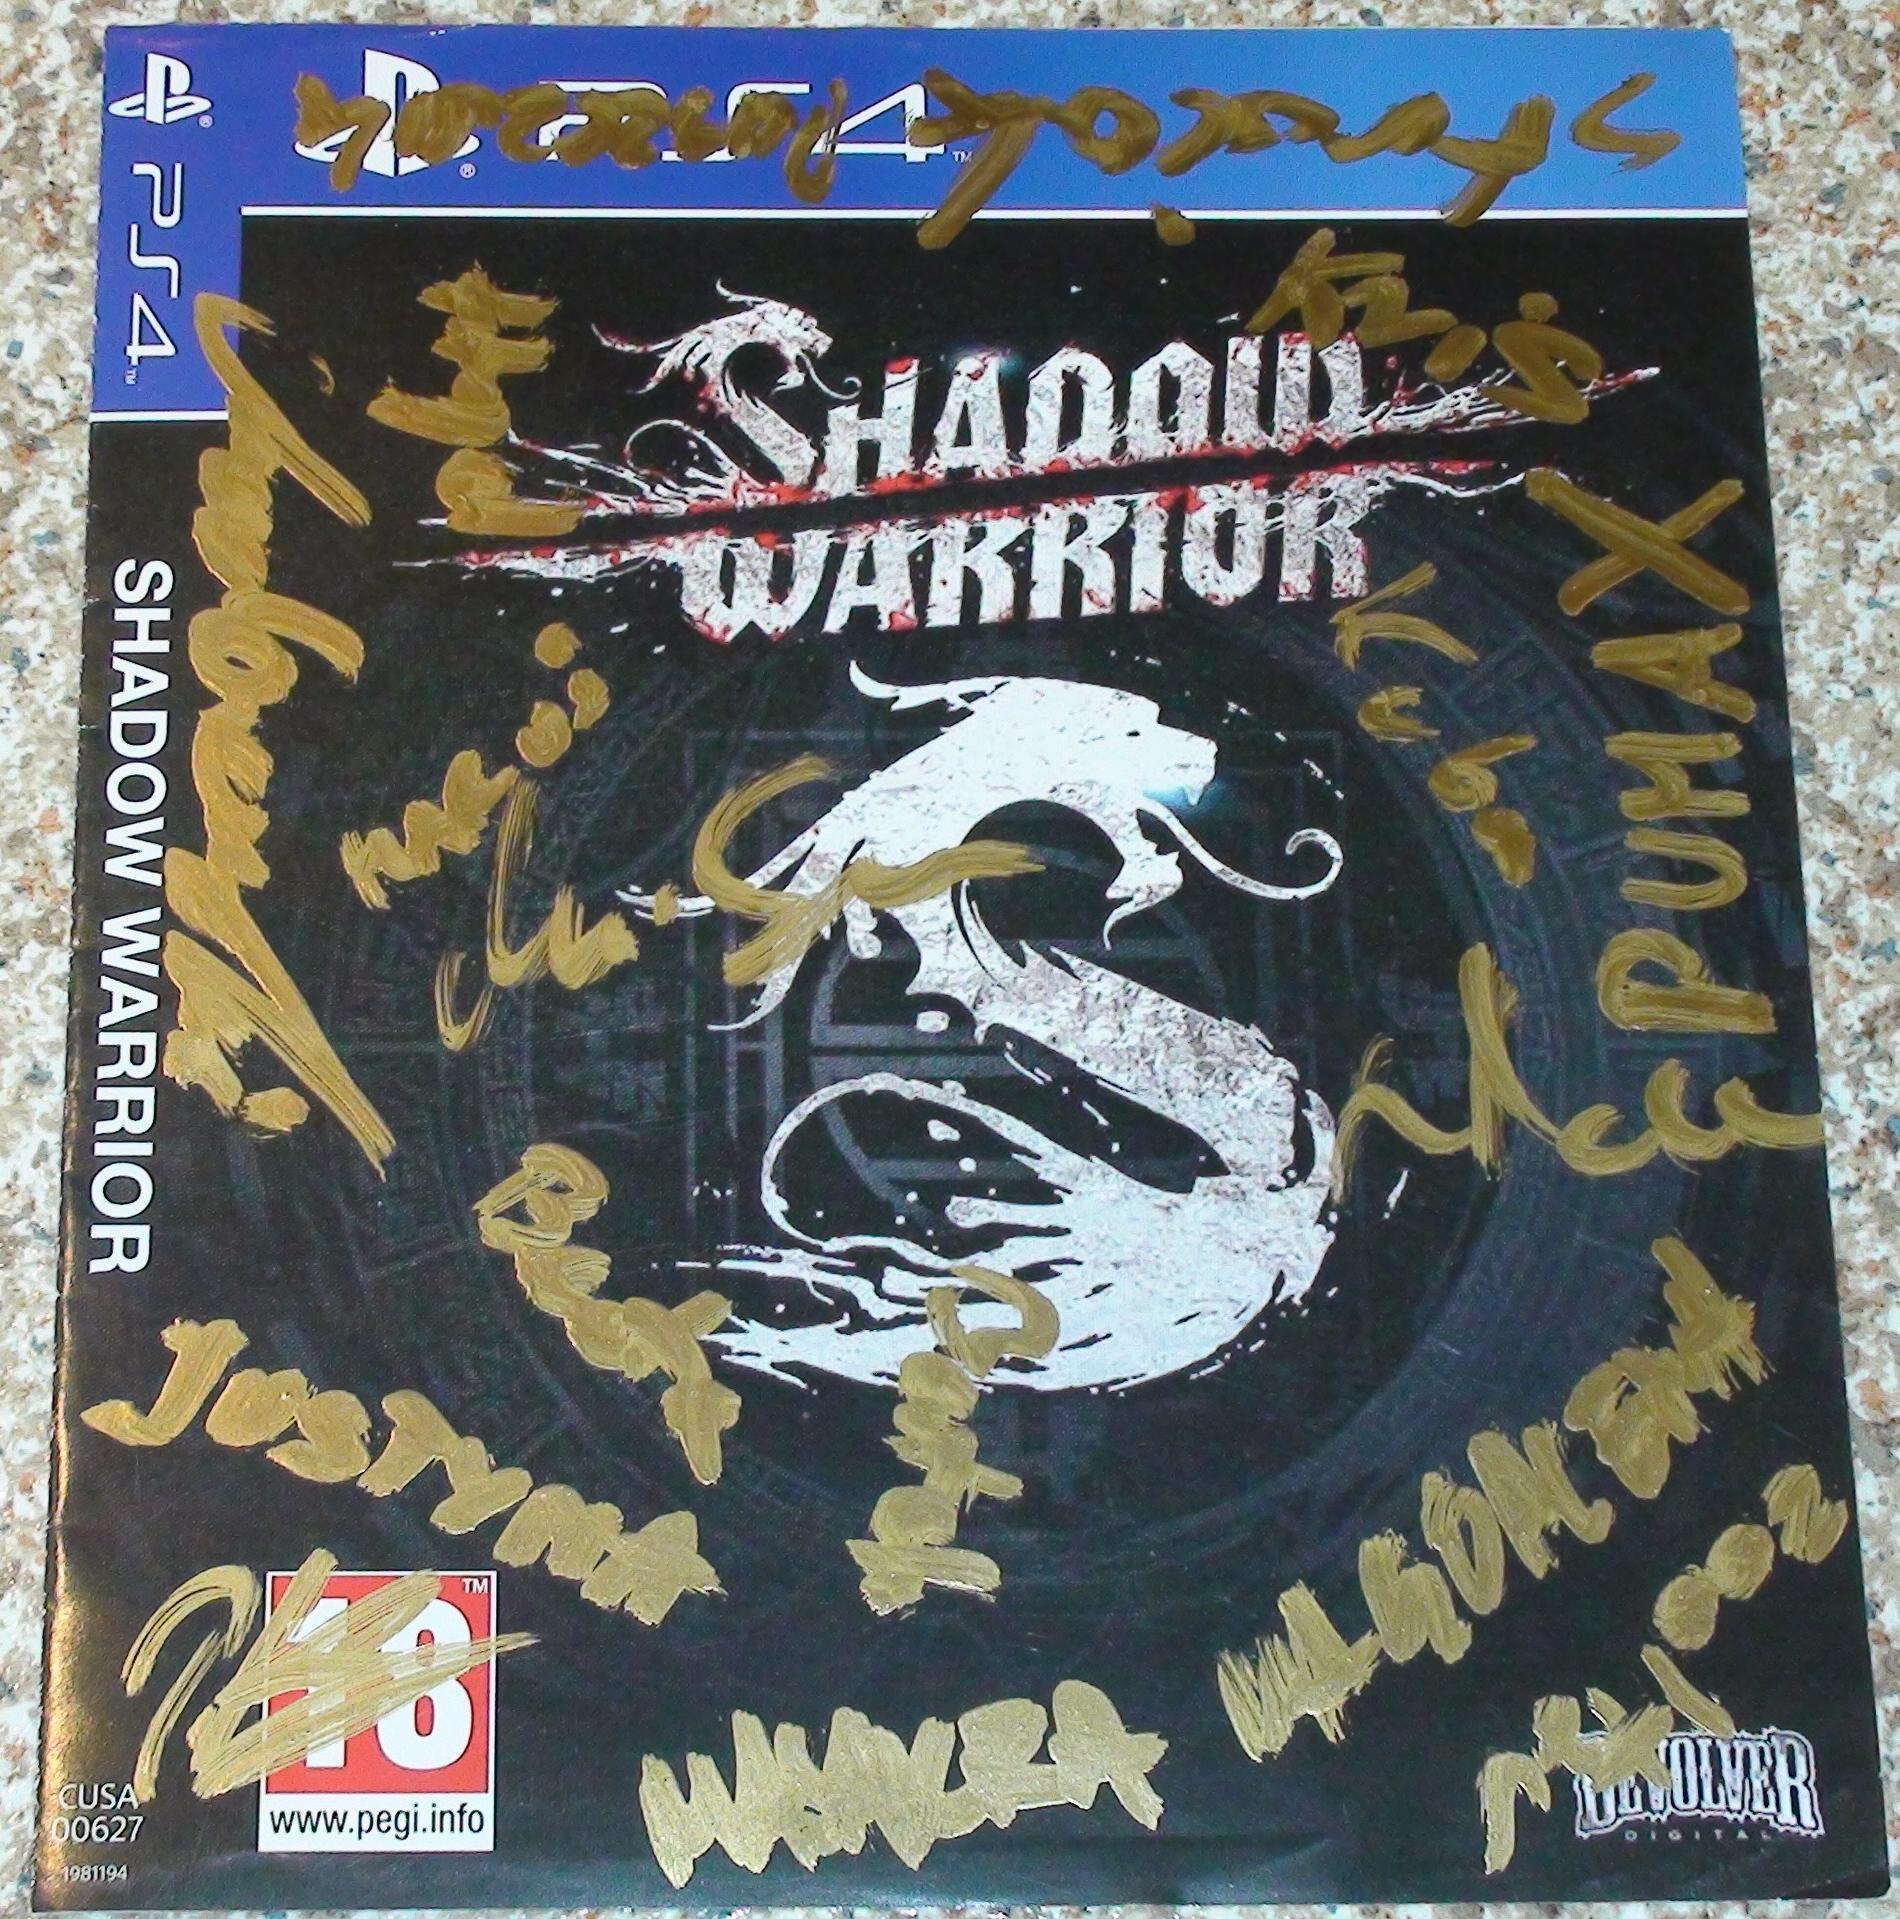 Shadow Warrior - Flying Wild Hog